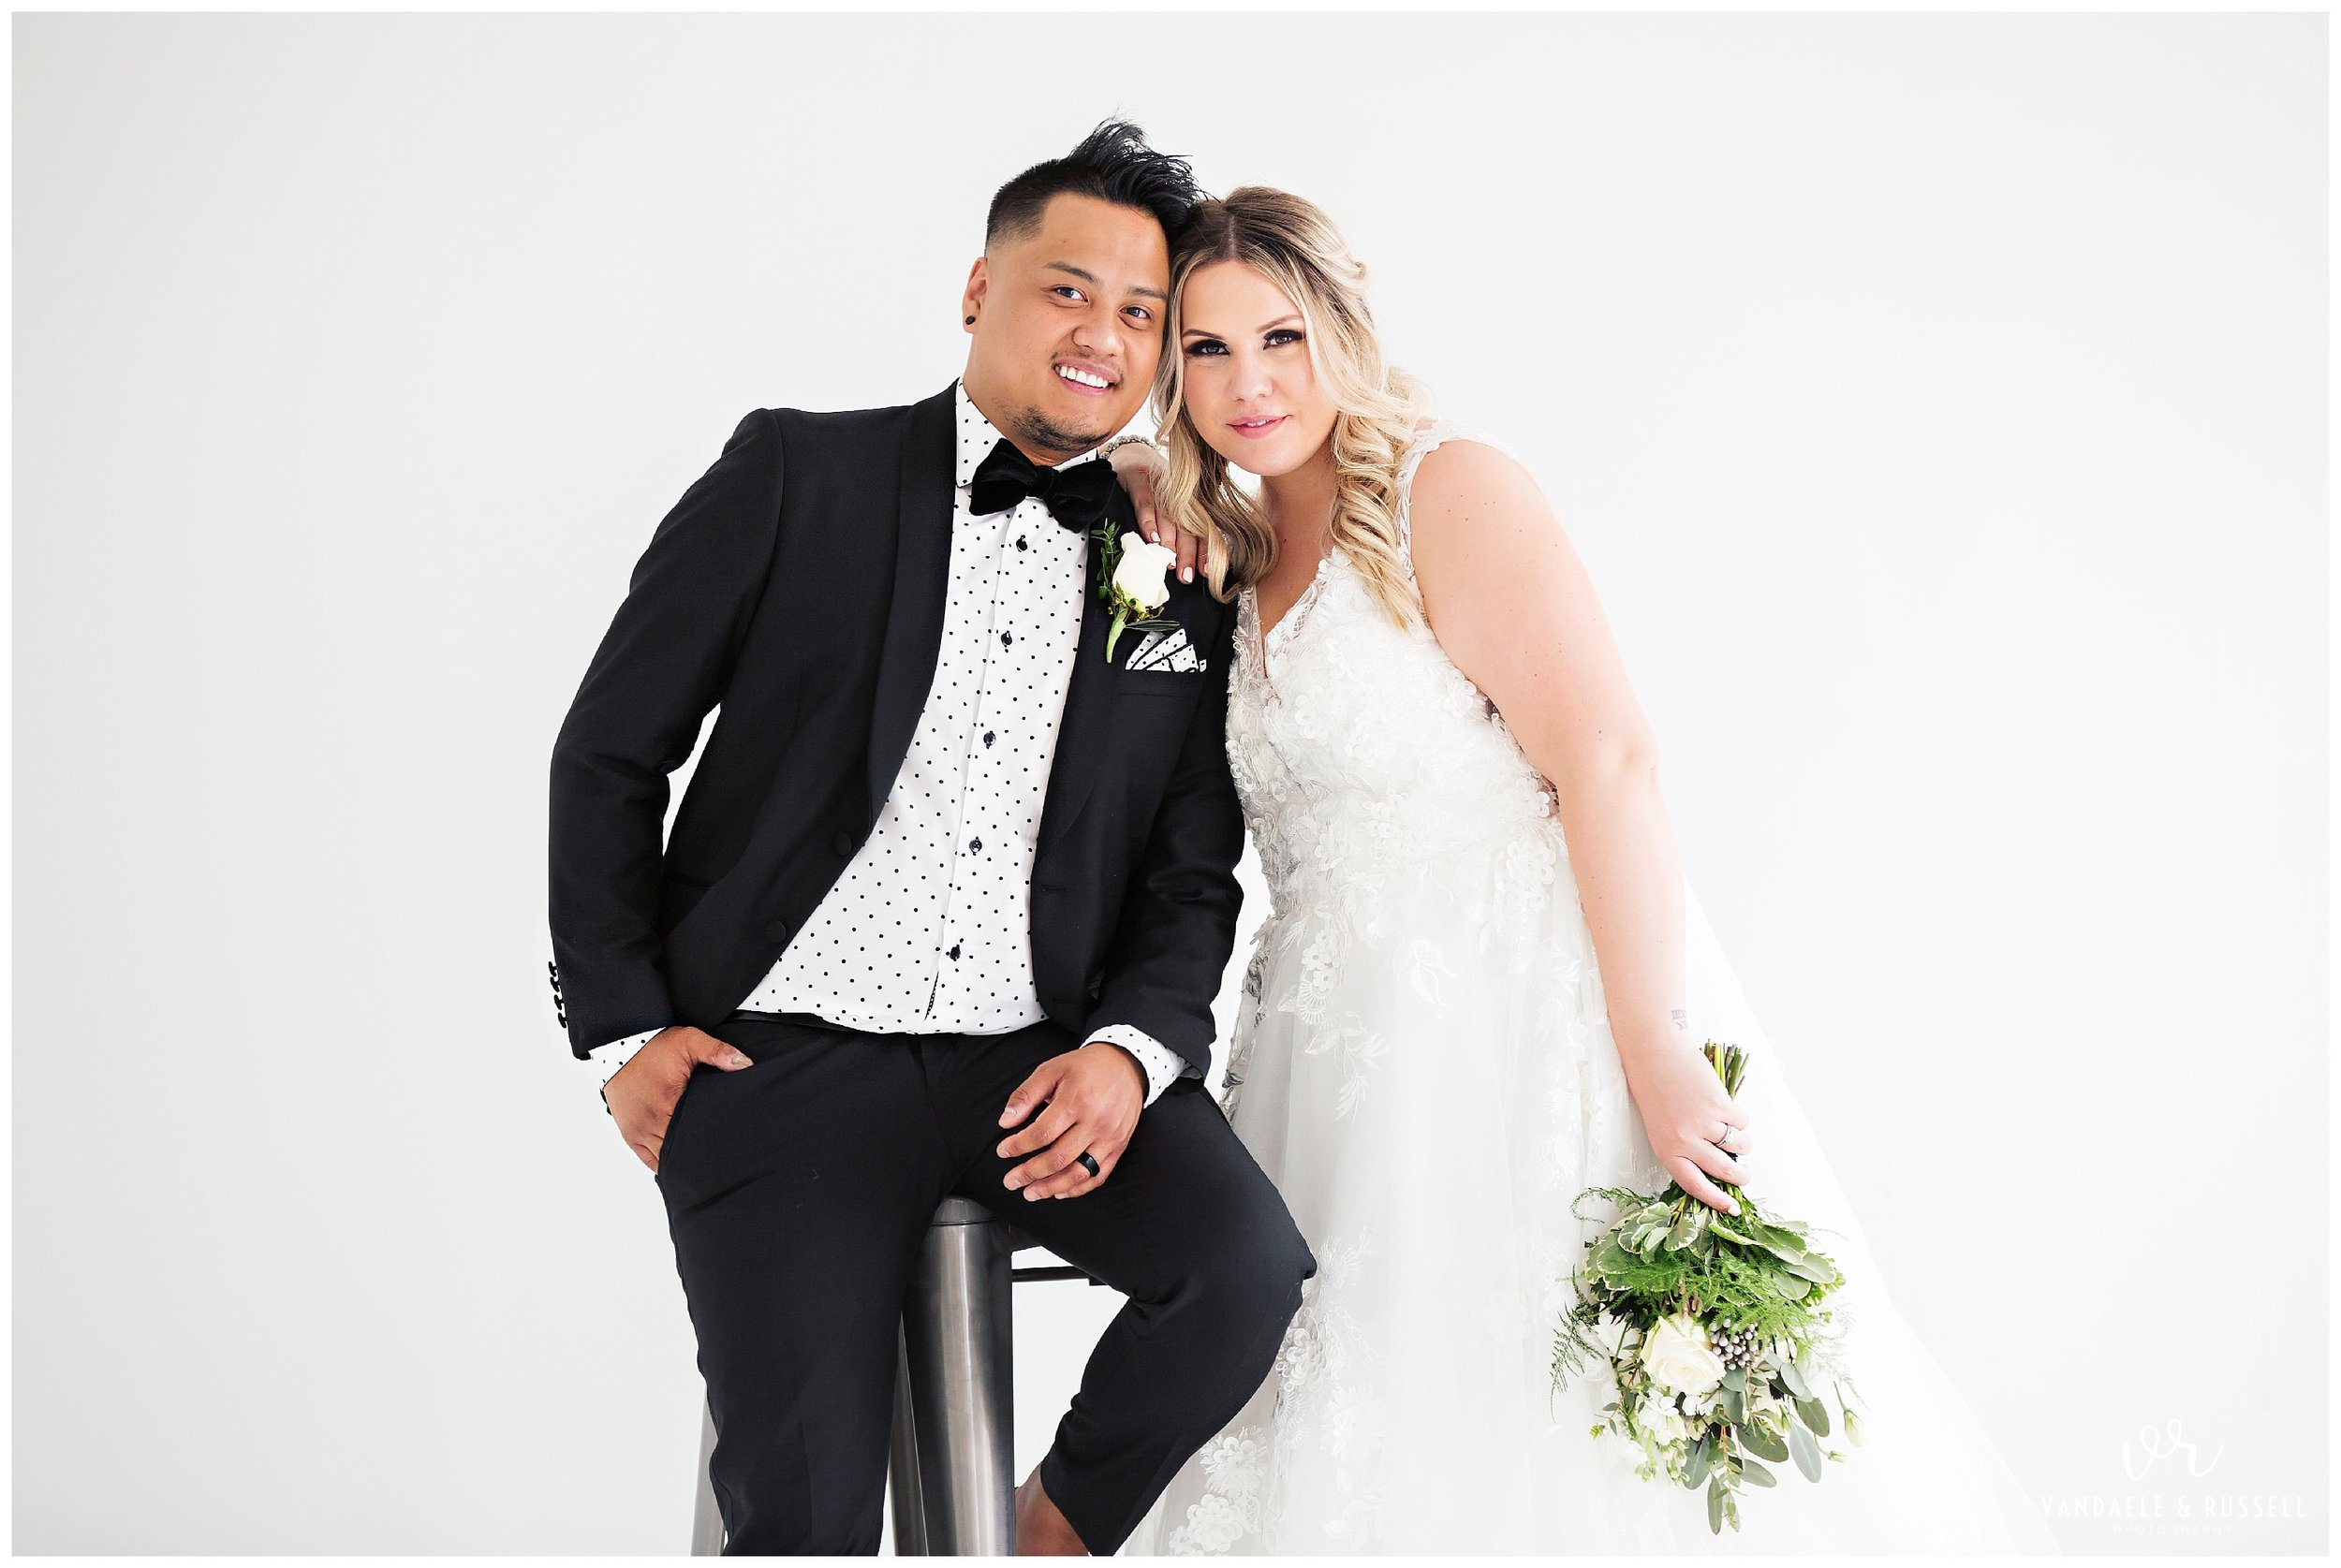 VanDaele-Russell-Wedding-Photography-London-Toronto-Ontario_0117.jpg